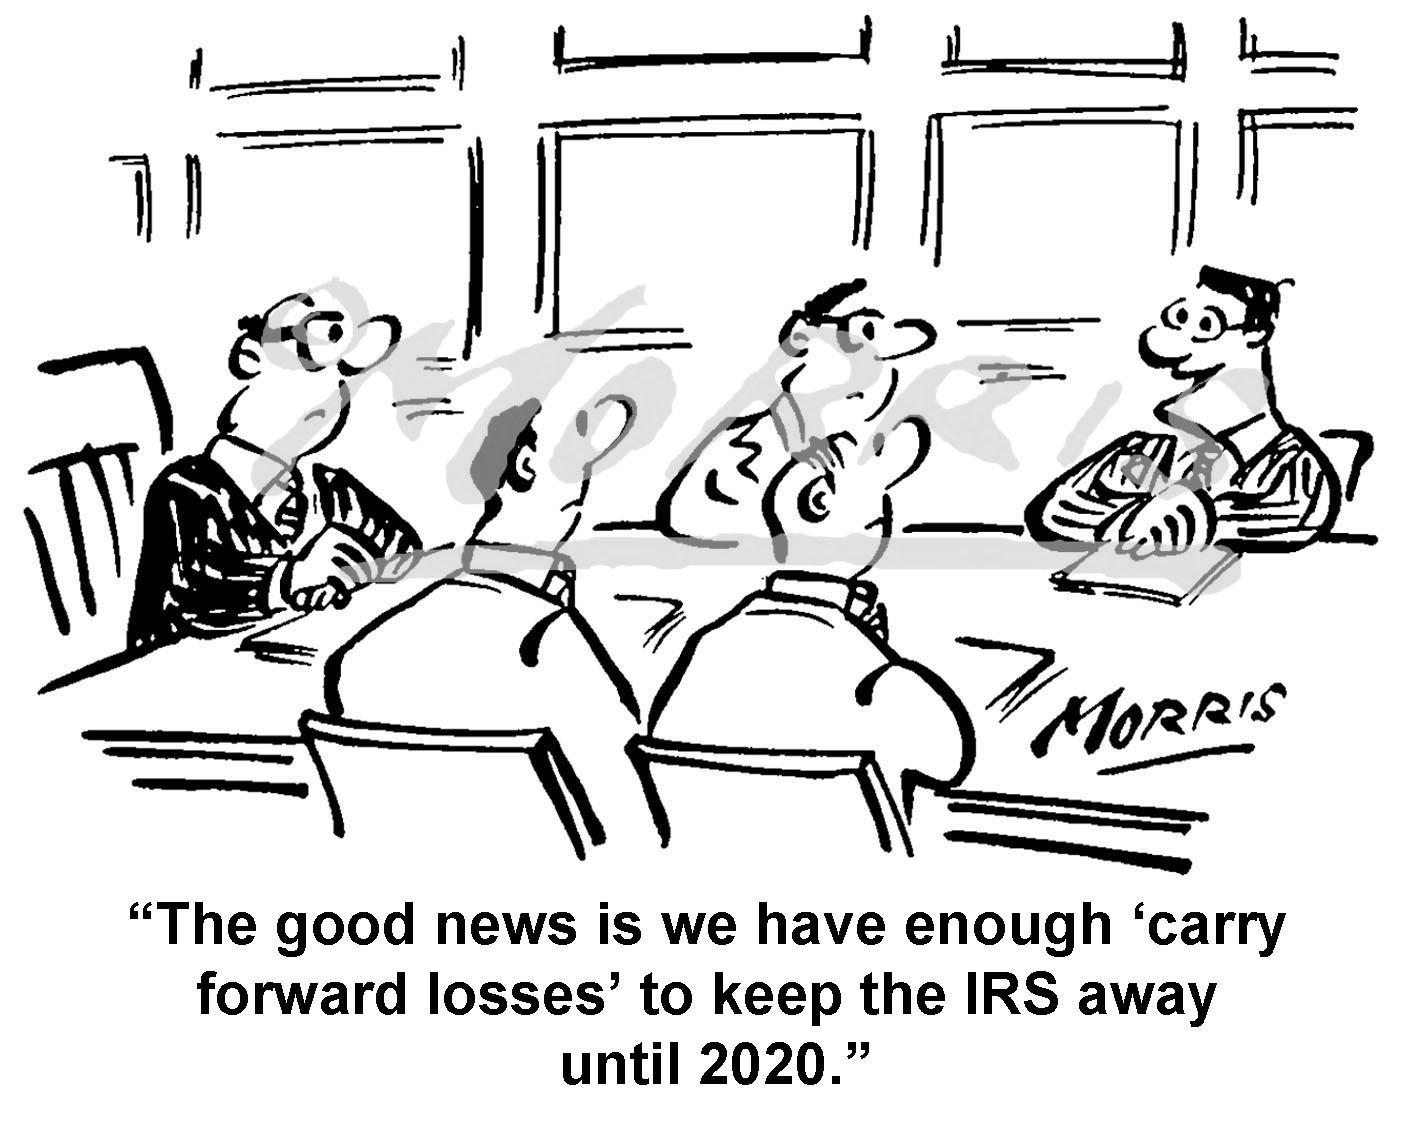 Boardroom cartoon, IRS cartoon, tax audit comic – Ref: 1499bwus